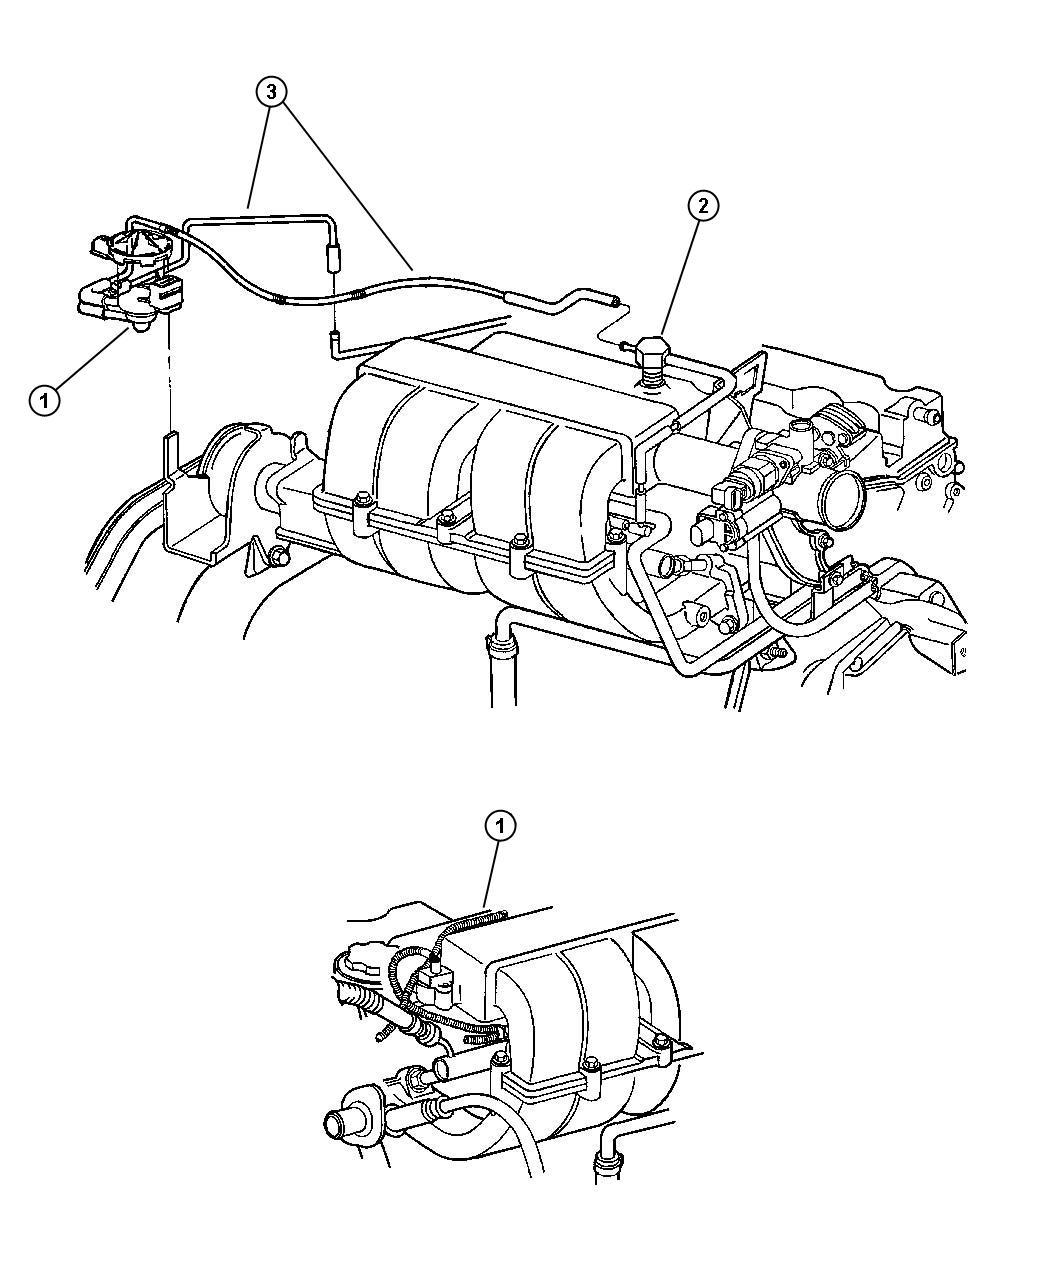 Emission Harness 2 4l Edz Engine